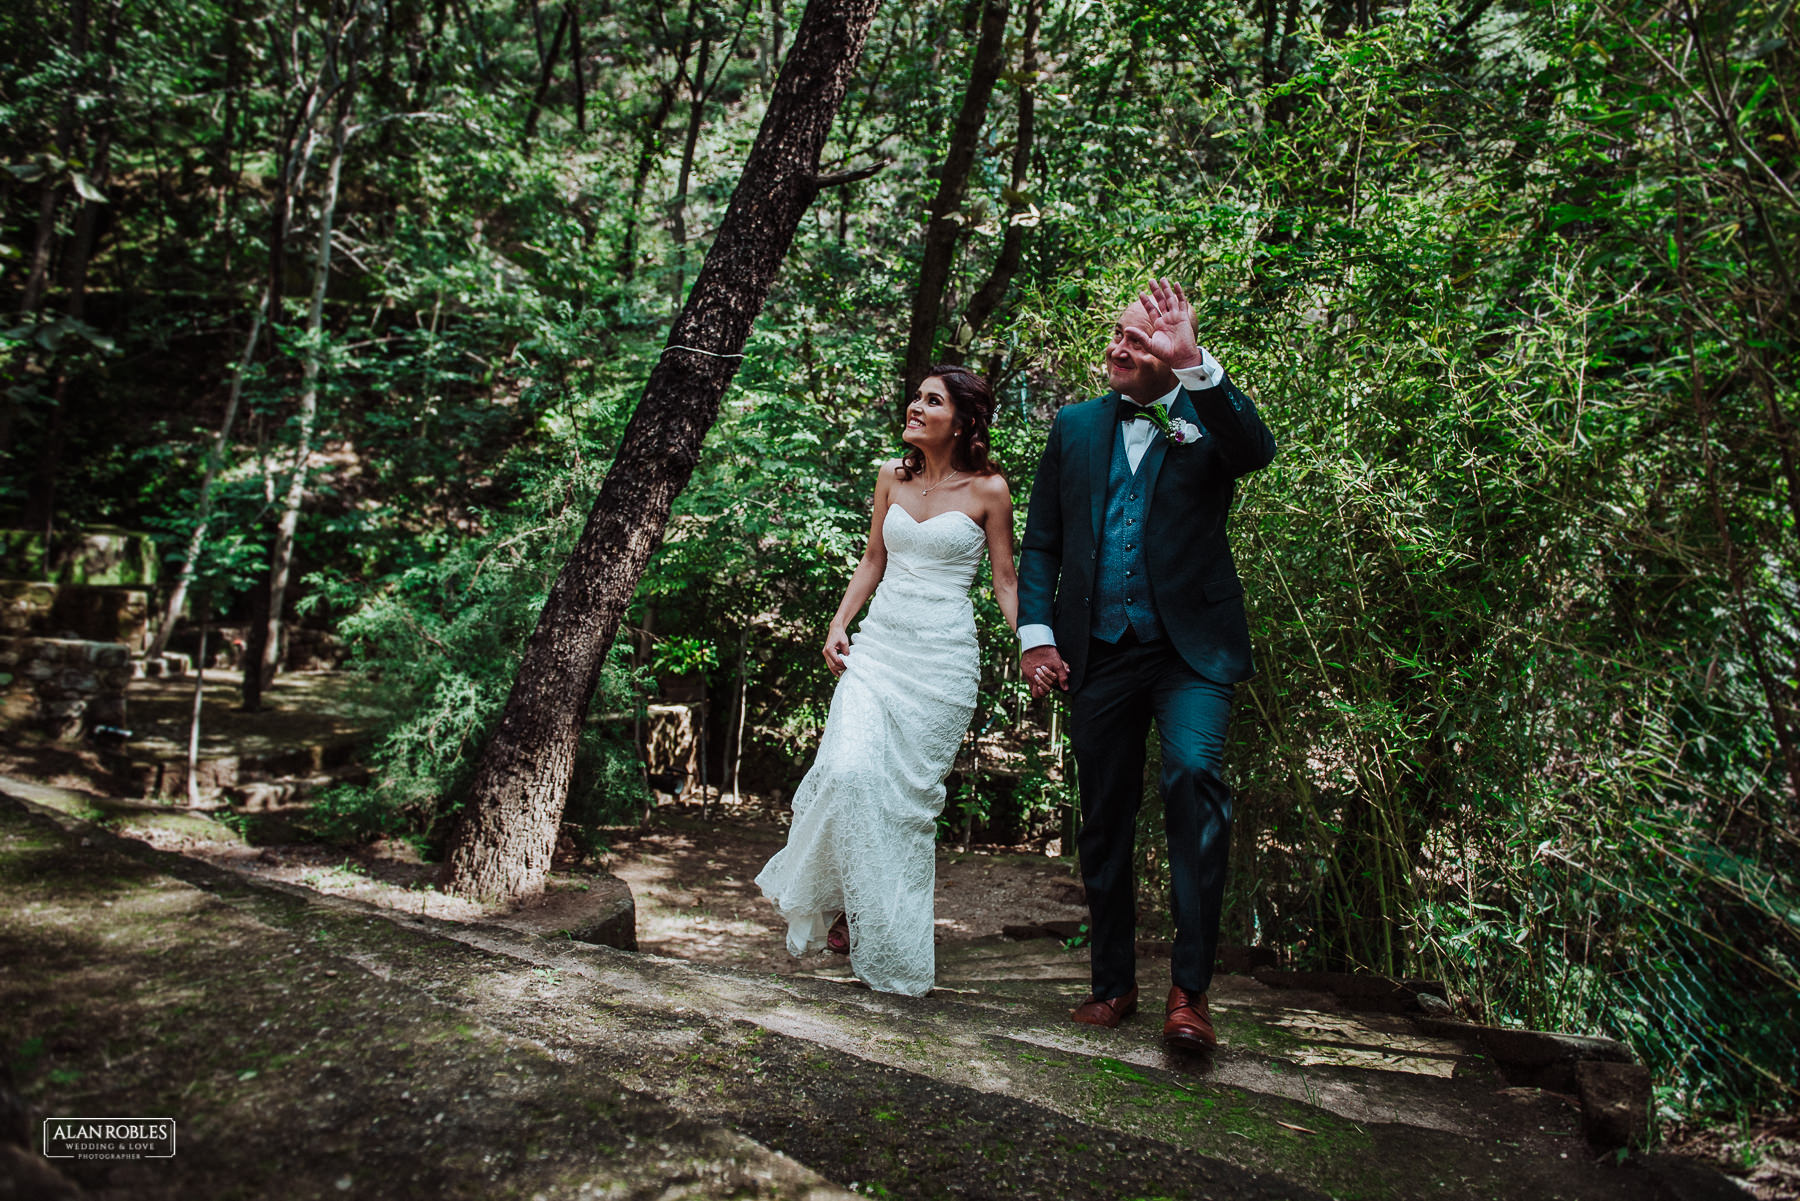 Fotografo de bodas guadalajara Alan Robles - Pinare terraza bistro 21